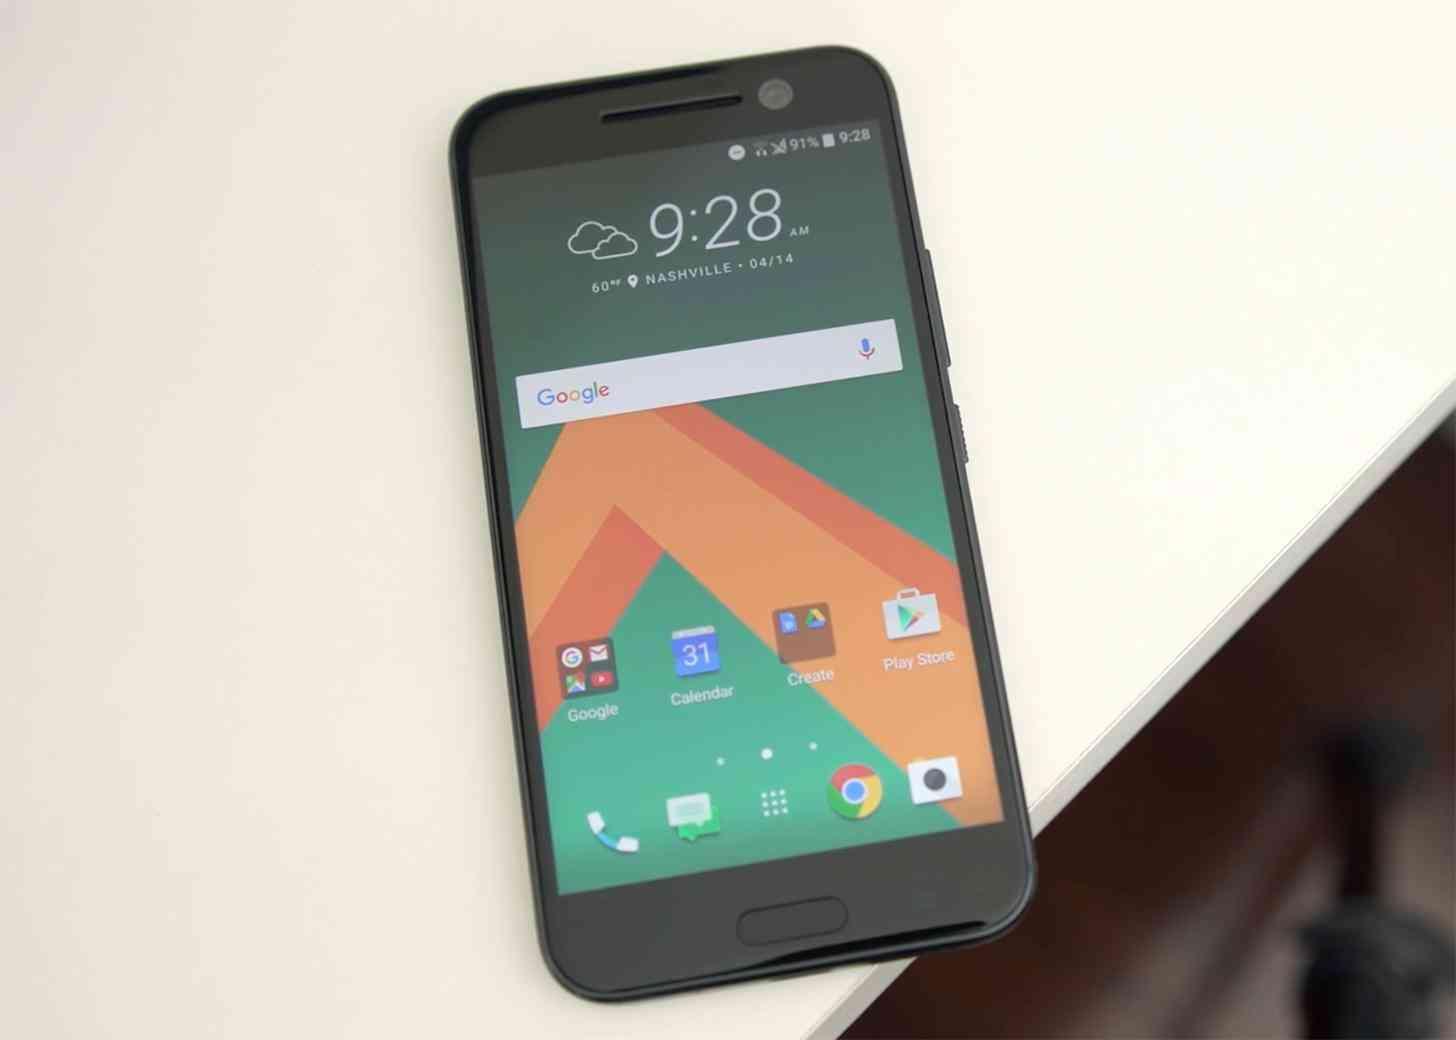 Unlocked HTC 10 getting Android 8.0 Oreo update | PhoneDog